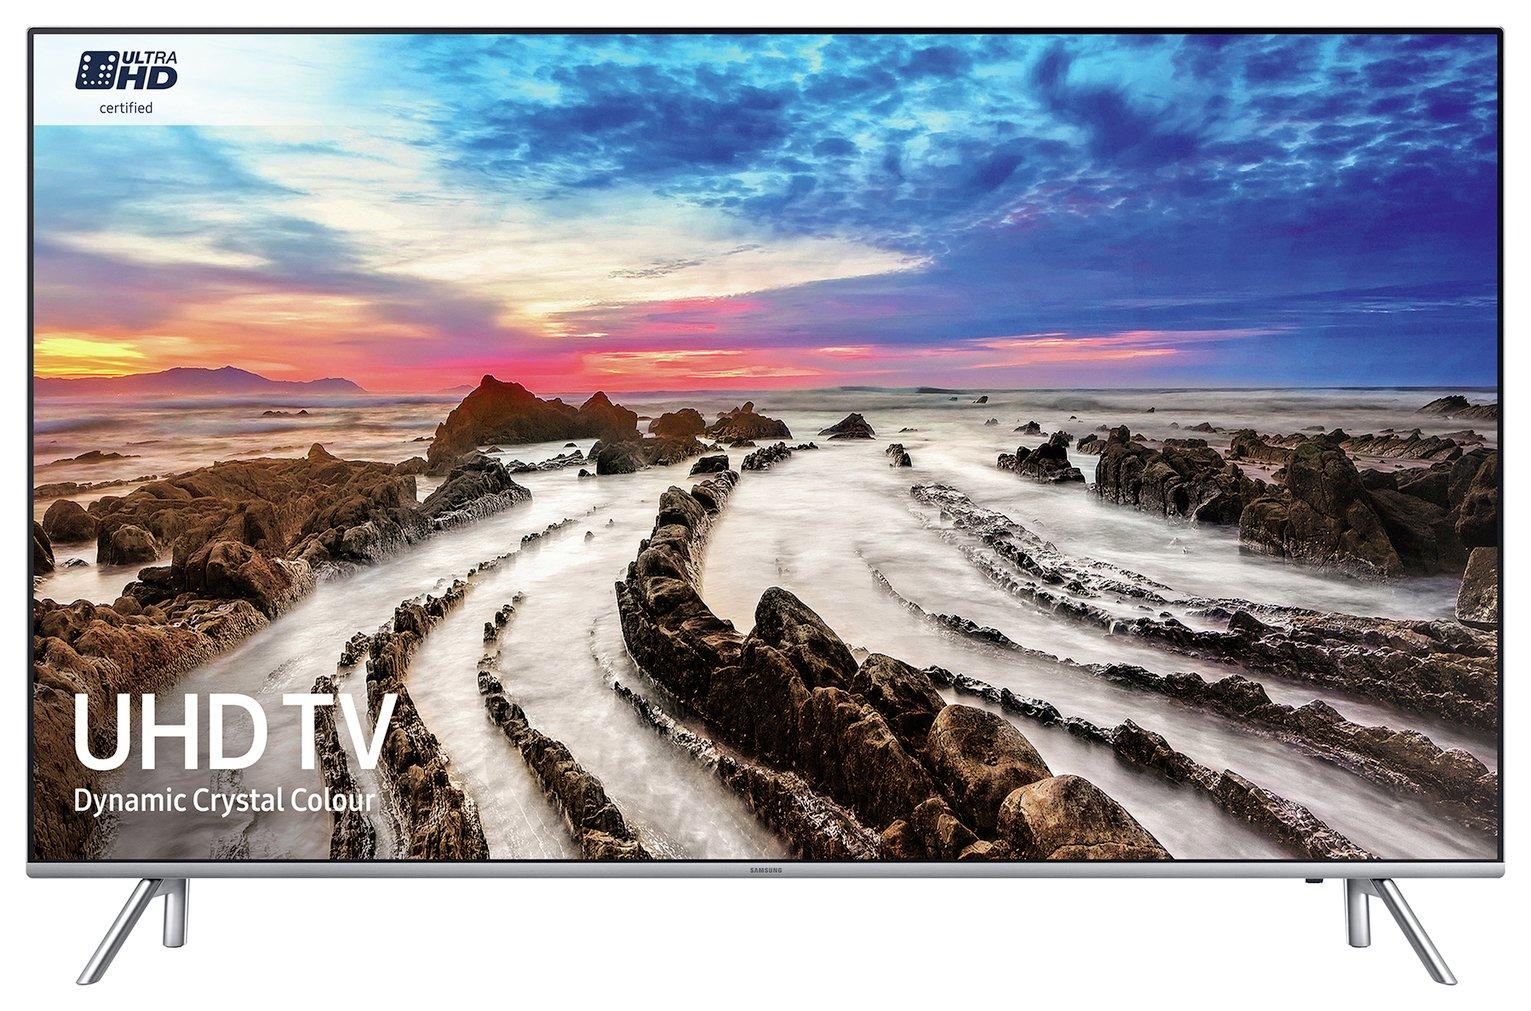 Samsung Samsung 49 Inch 49MU7000 Smart 4K UHD TV with HDR1000